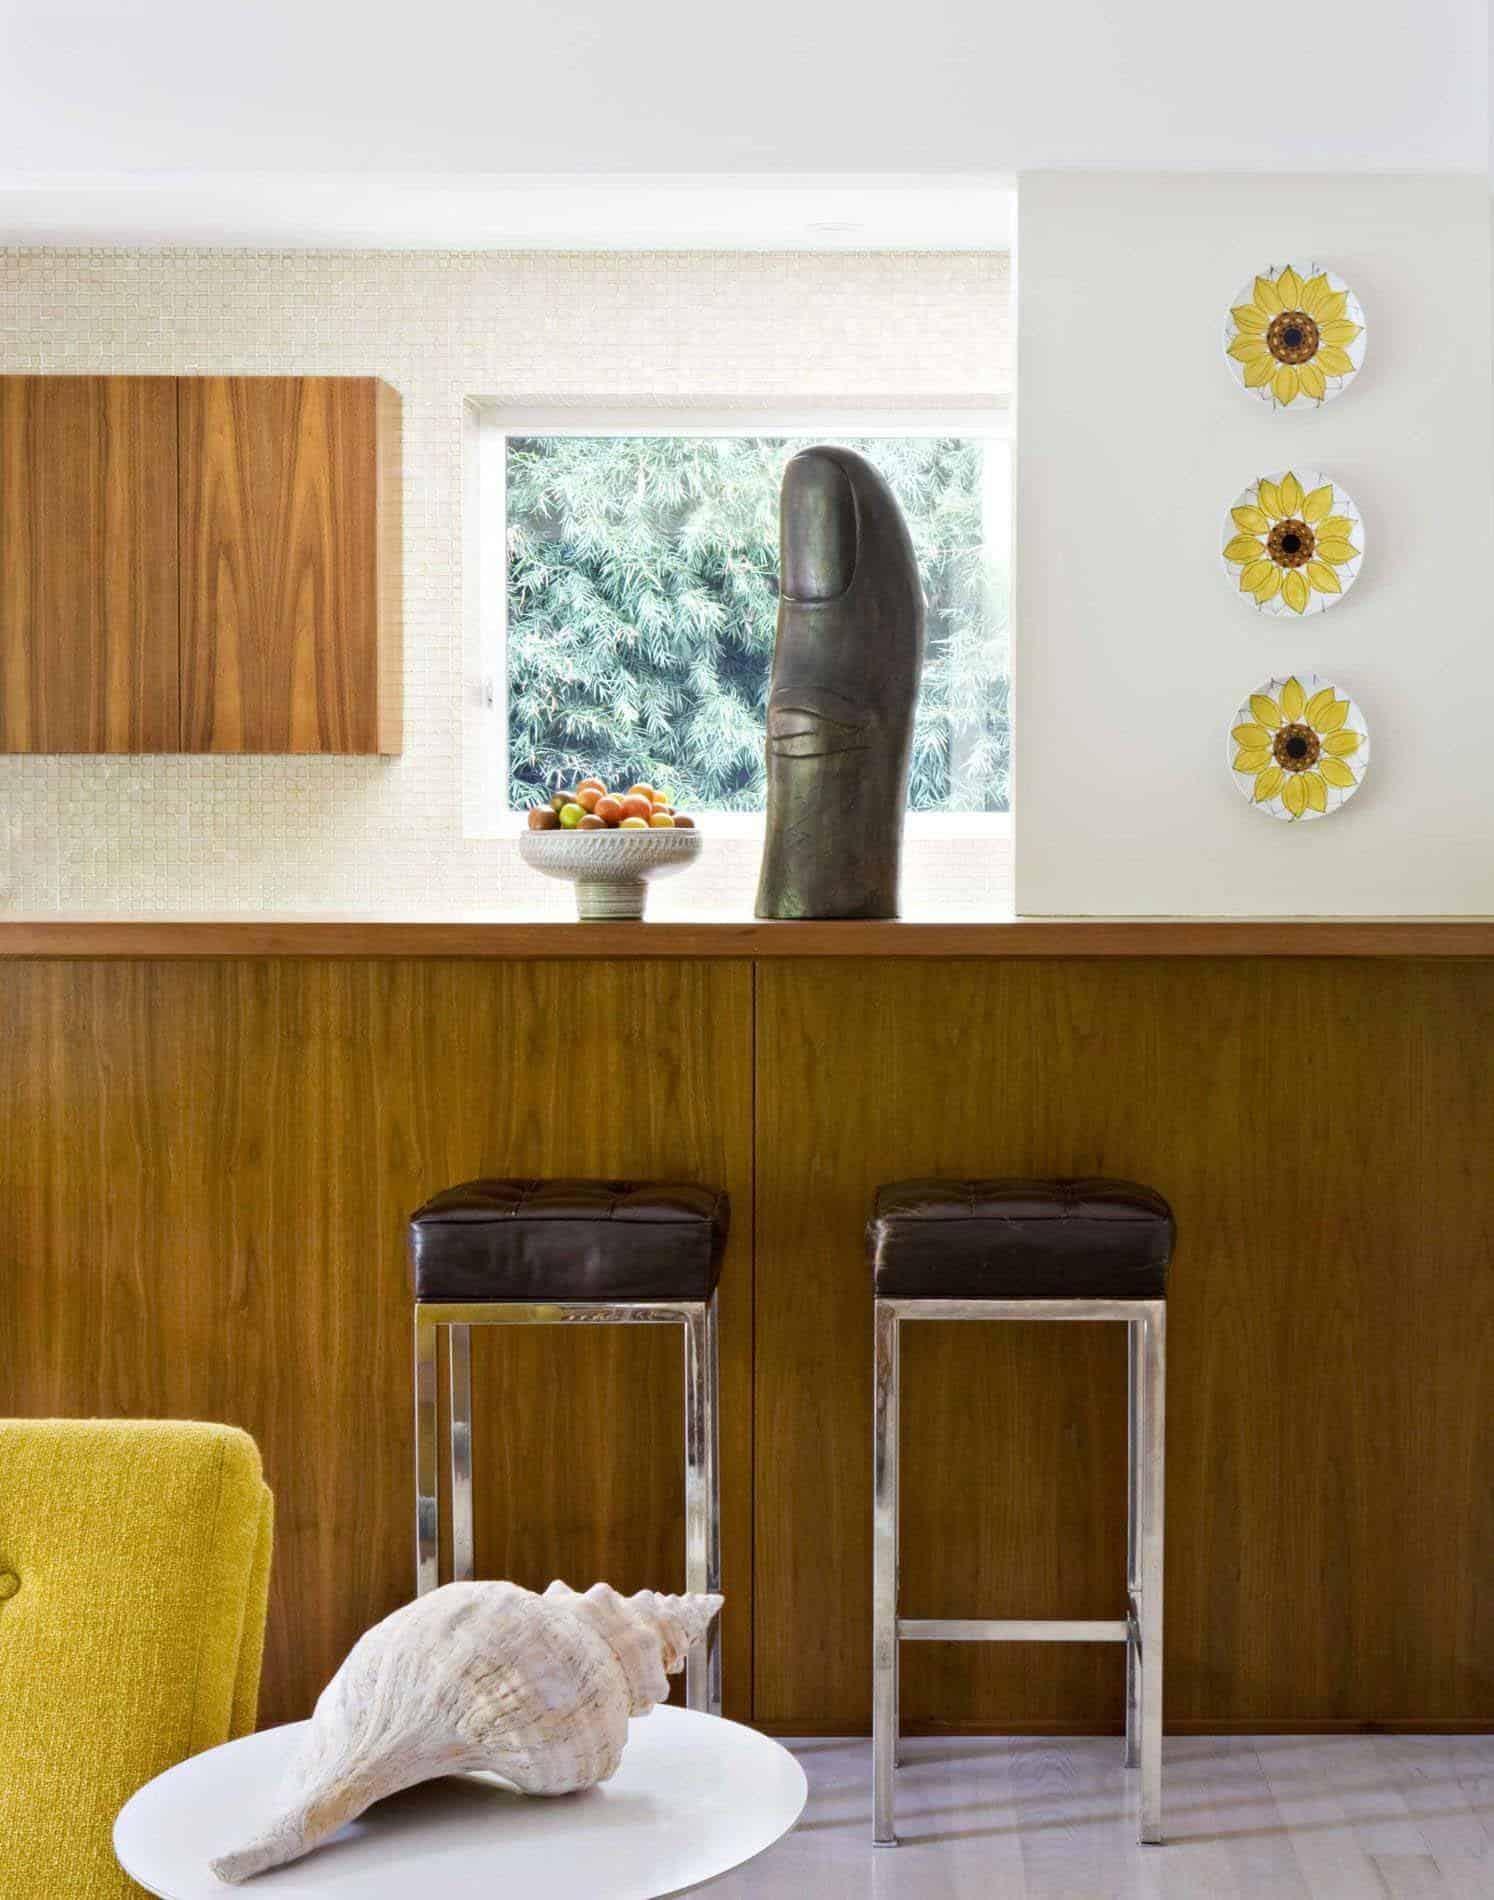 Maison Moderne Mid-Century-Jamie Bush-03-1 Kindesign